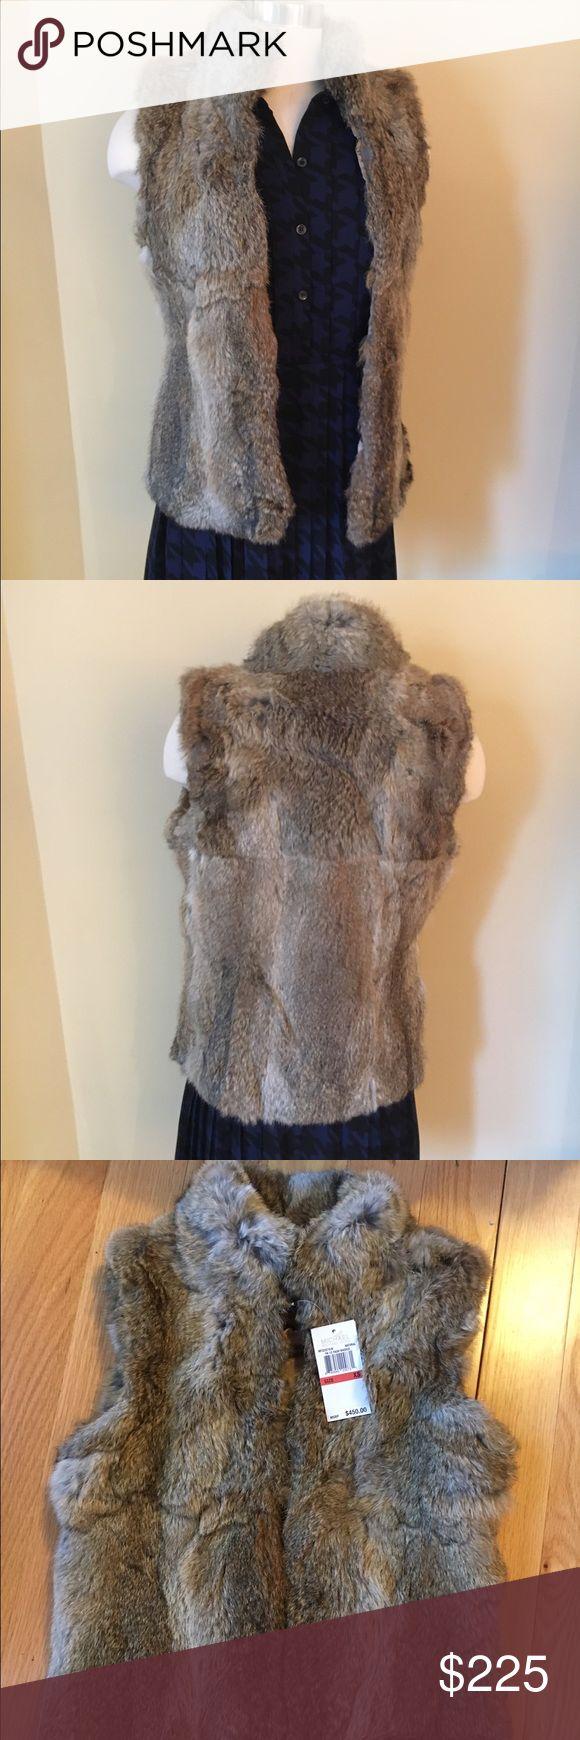 NEWMichael Kors Fur Vest NEW MK Fur Vest. Gorgeous Fur Vest. 50% Off Retail price. Perfect for the Holidays!   % real rabbit fur. ❌no trading or holding Michael Kors Jackets & Coats Vests